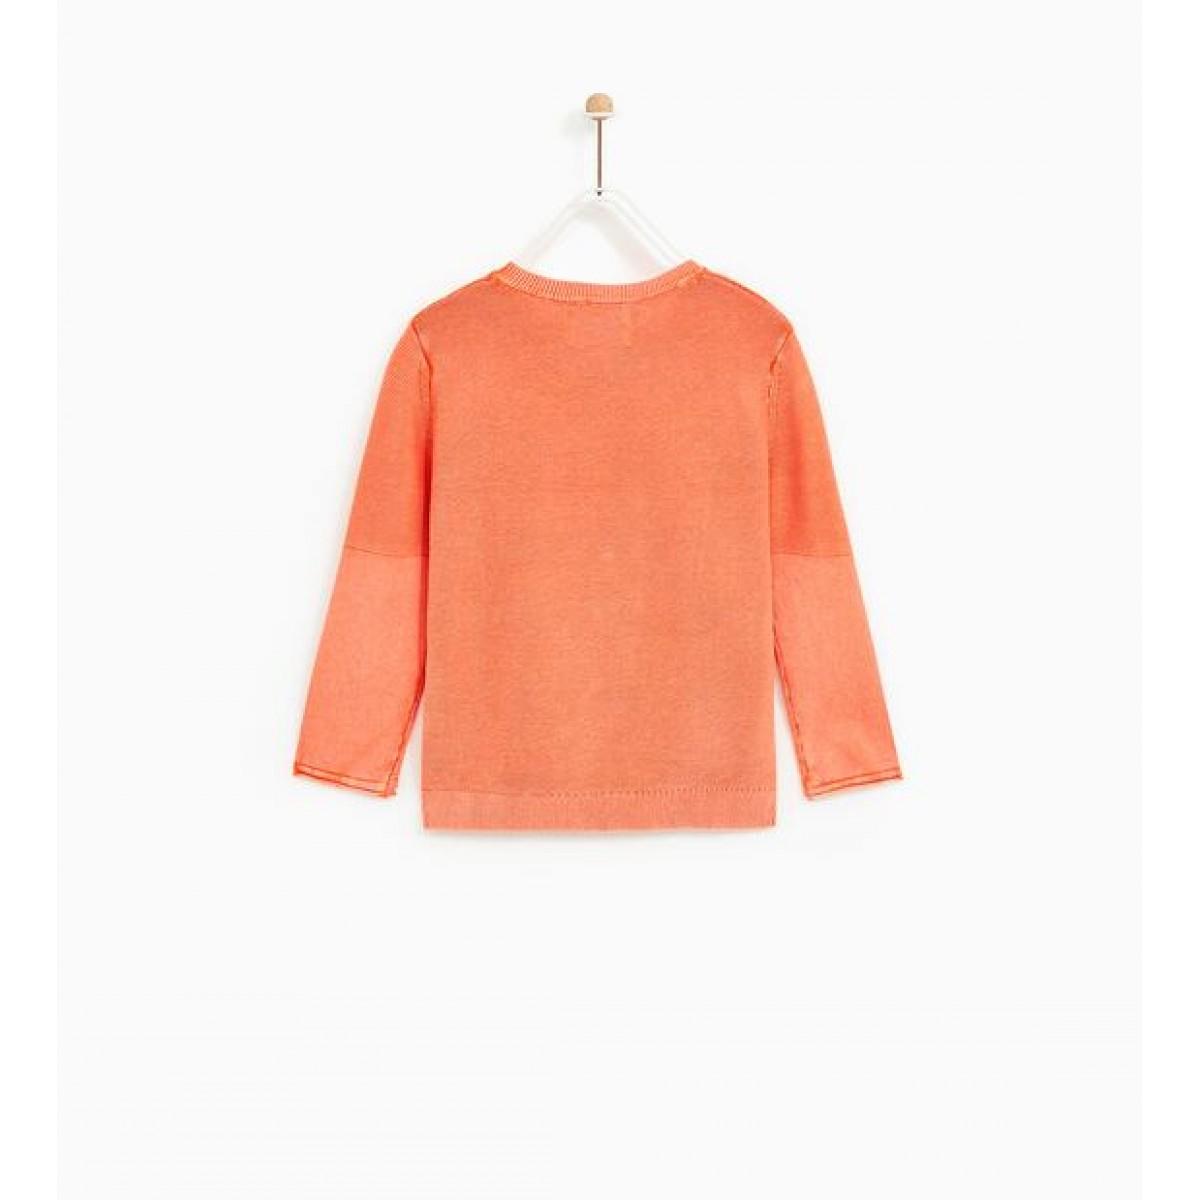 Zara Sweater With Rubberised Print